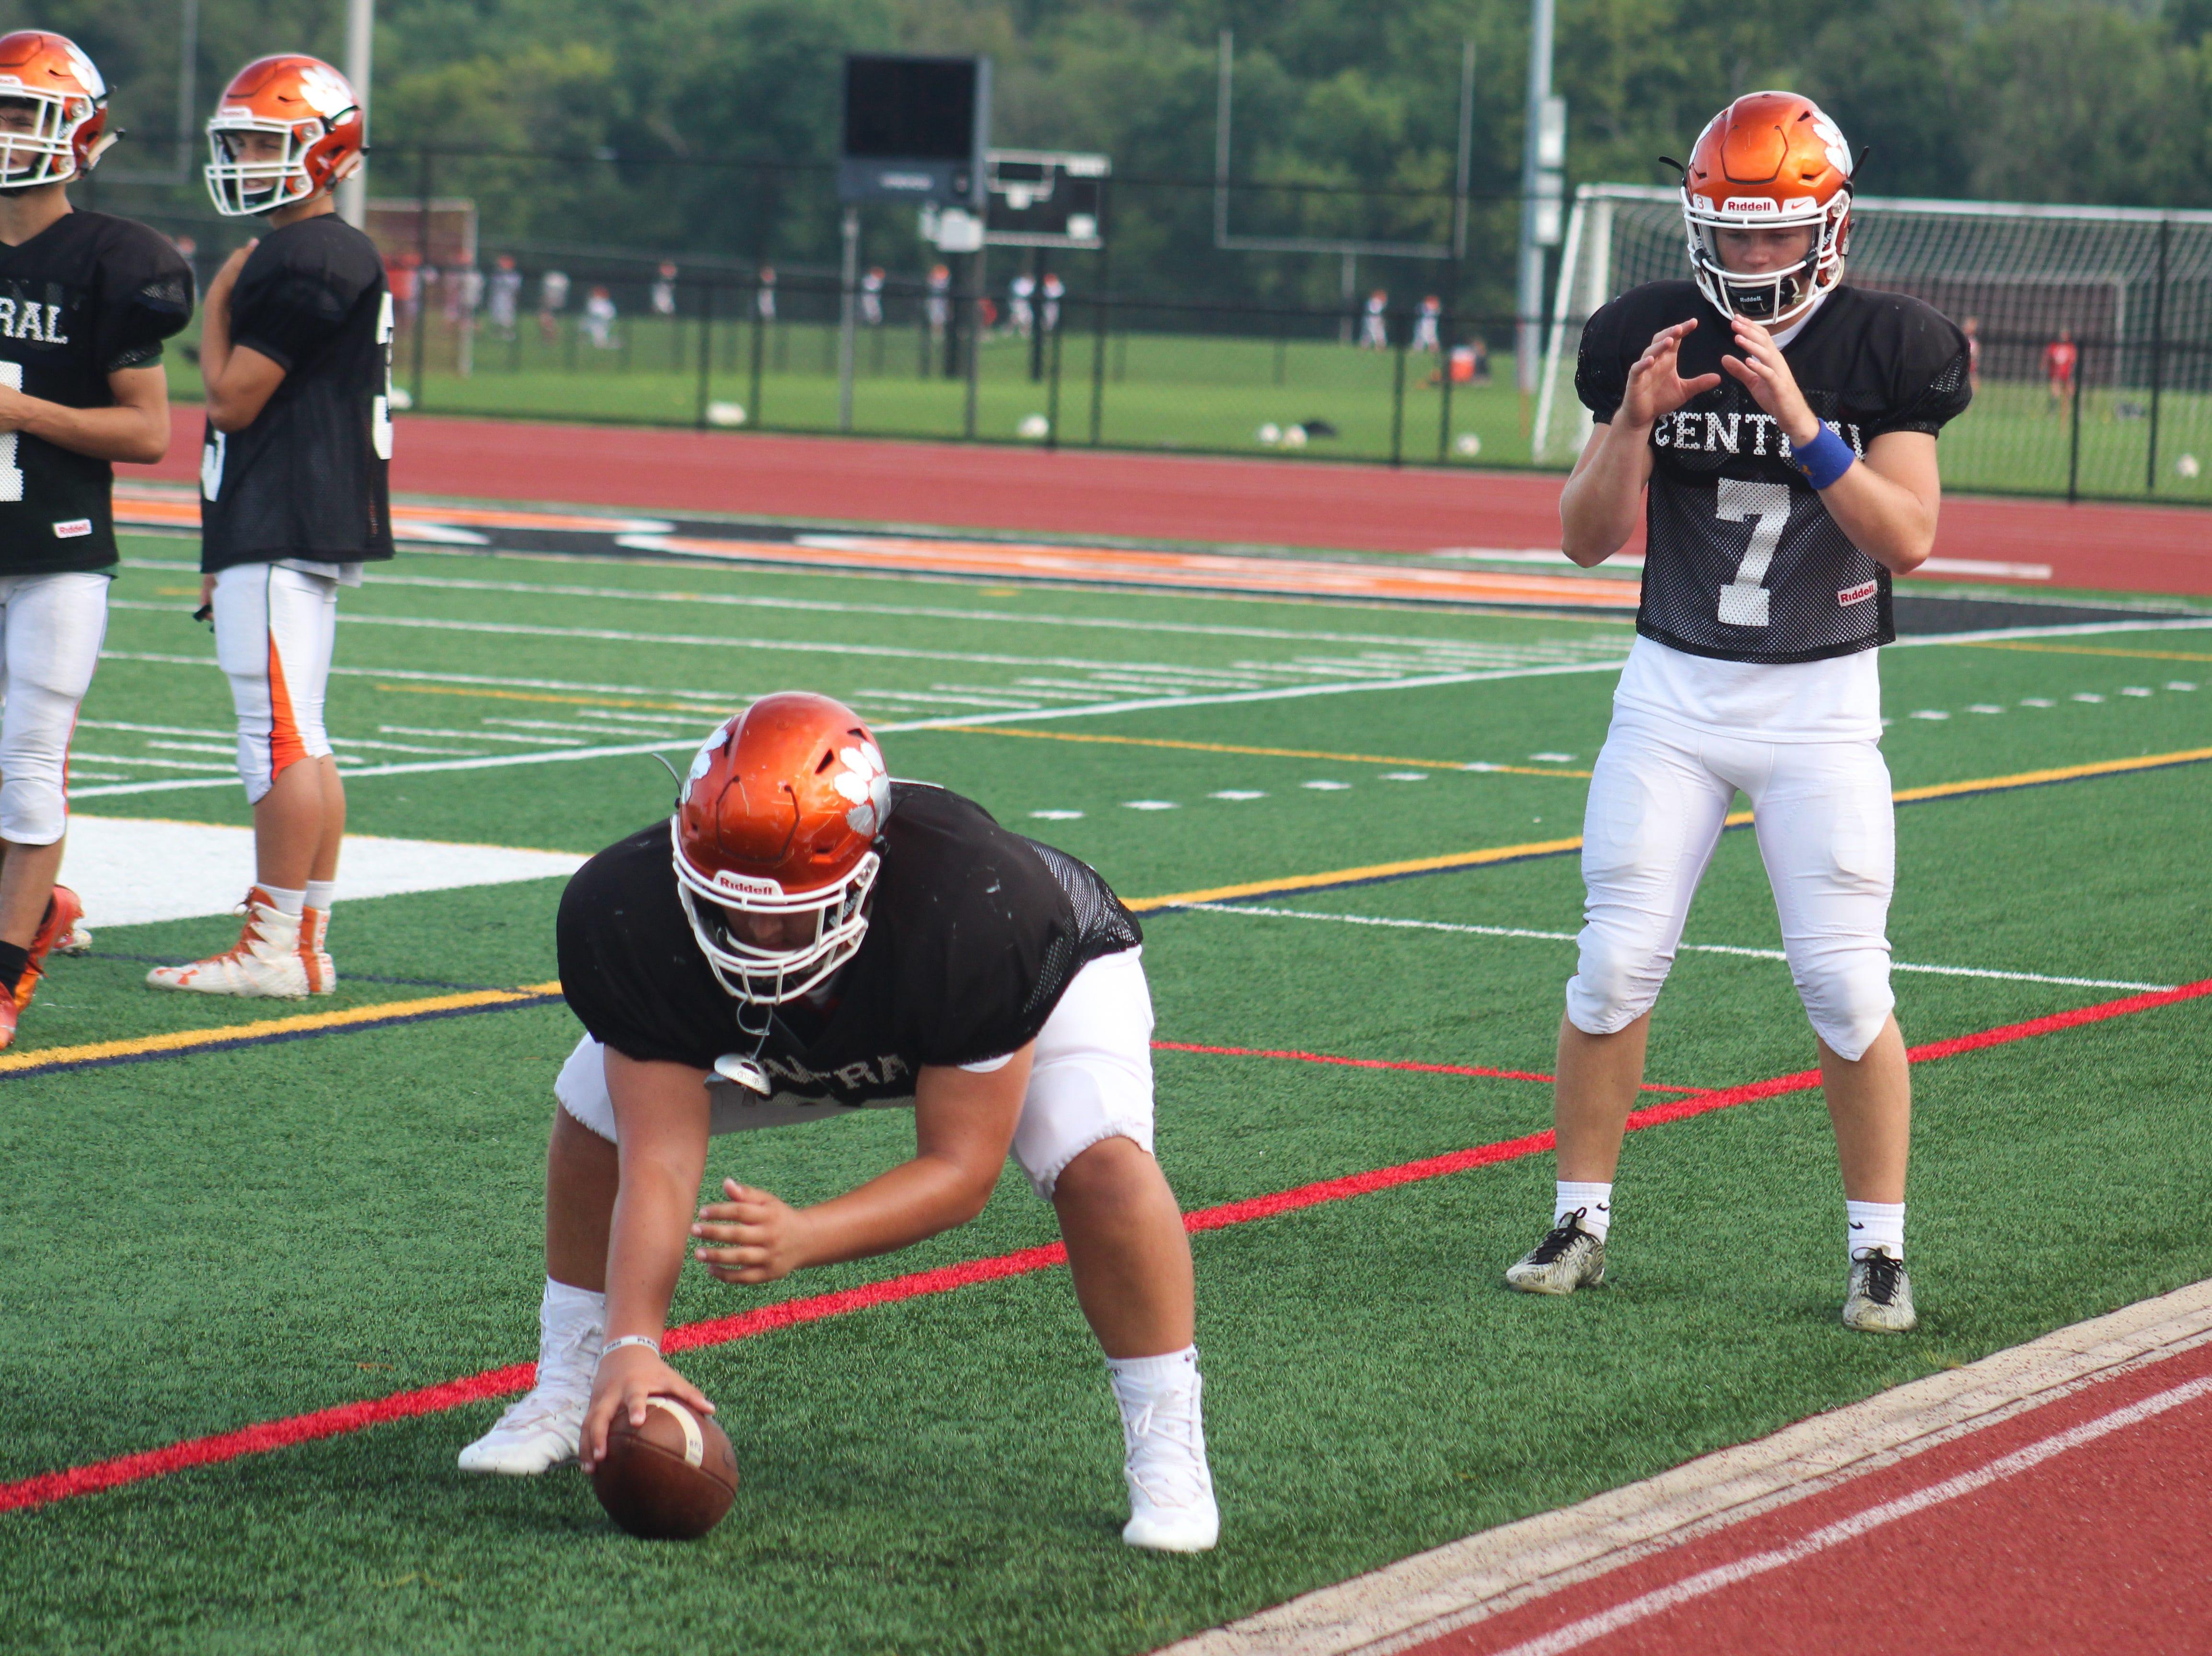 A quarterback and a center for Central York High School practice shotgun snaps.